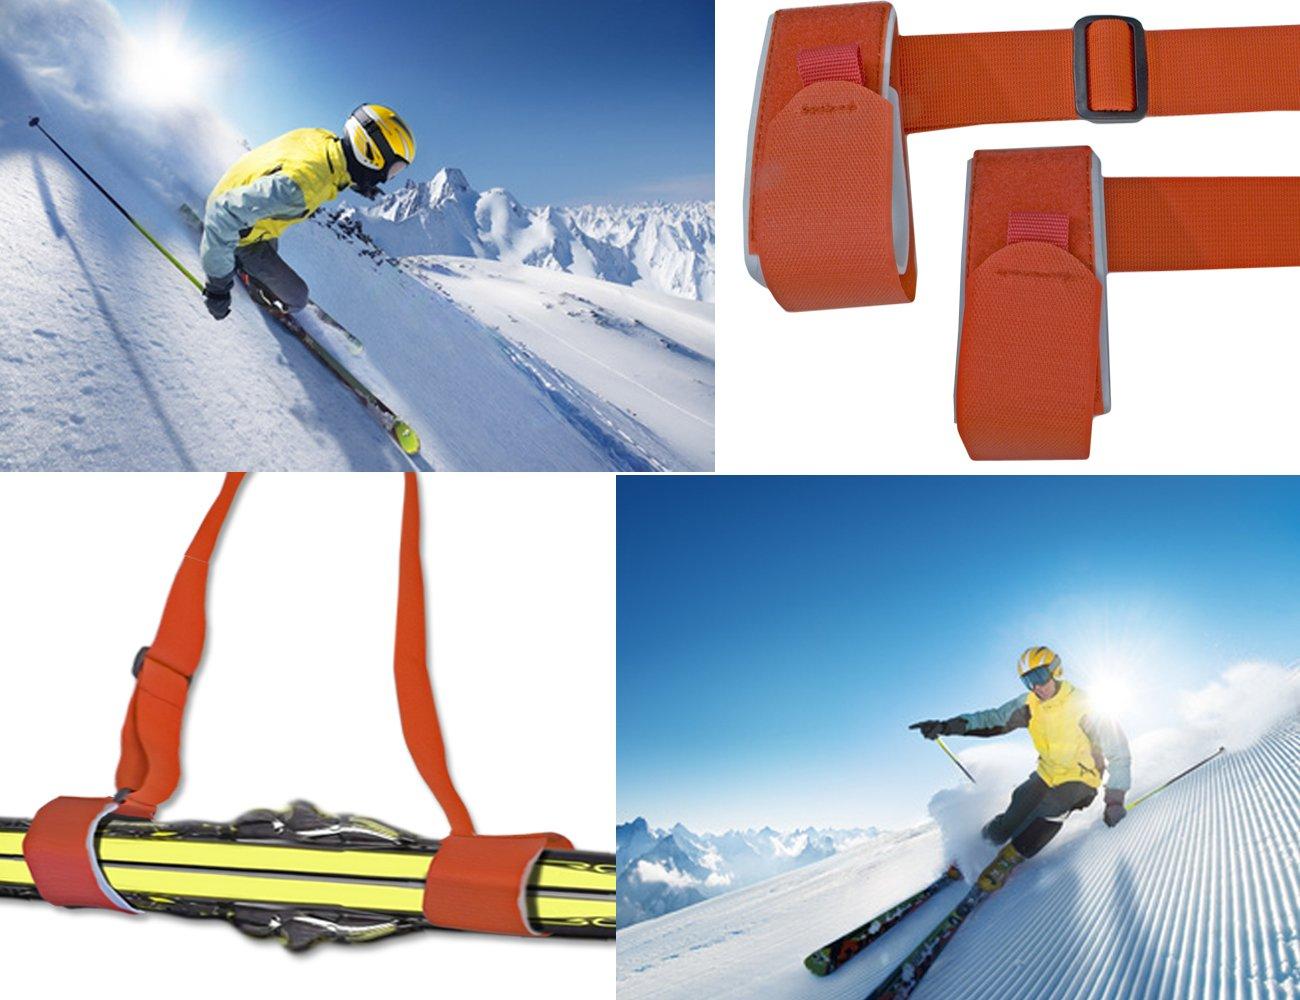 Glamia Home Tools EU/® Ski Strap Carry Strap /Shoulder Strap for Skis and Ski Poles of Skis Ski Touring Cross Country Ski 3/Colours Carry Straps/